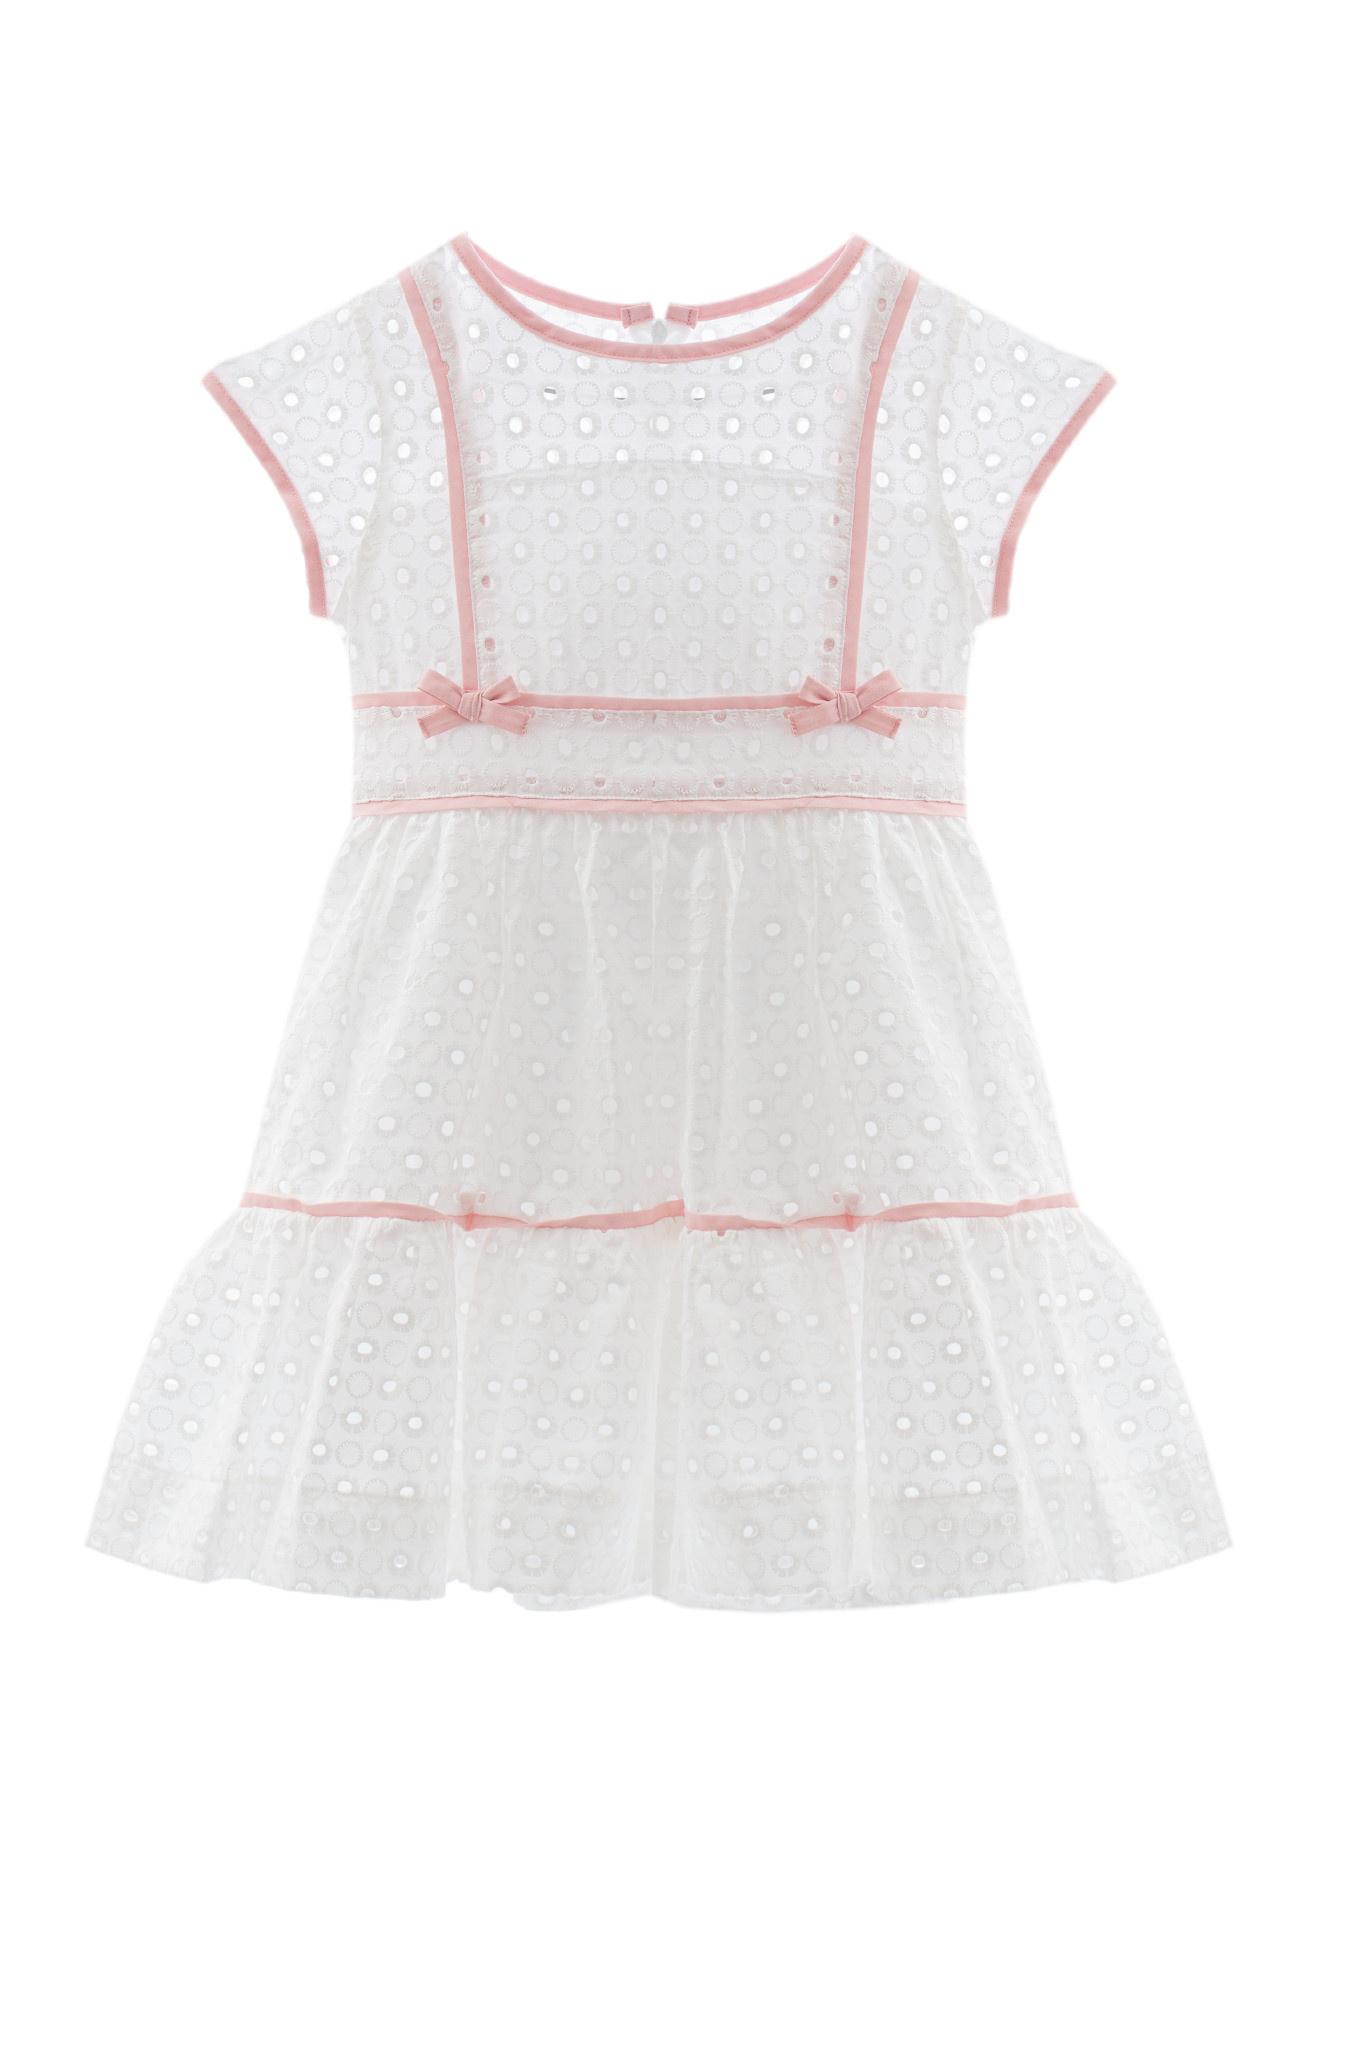 Patachou Patachou 412 White Dress with Pink Trim & Cap Sleeves